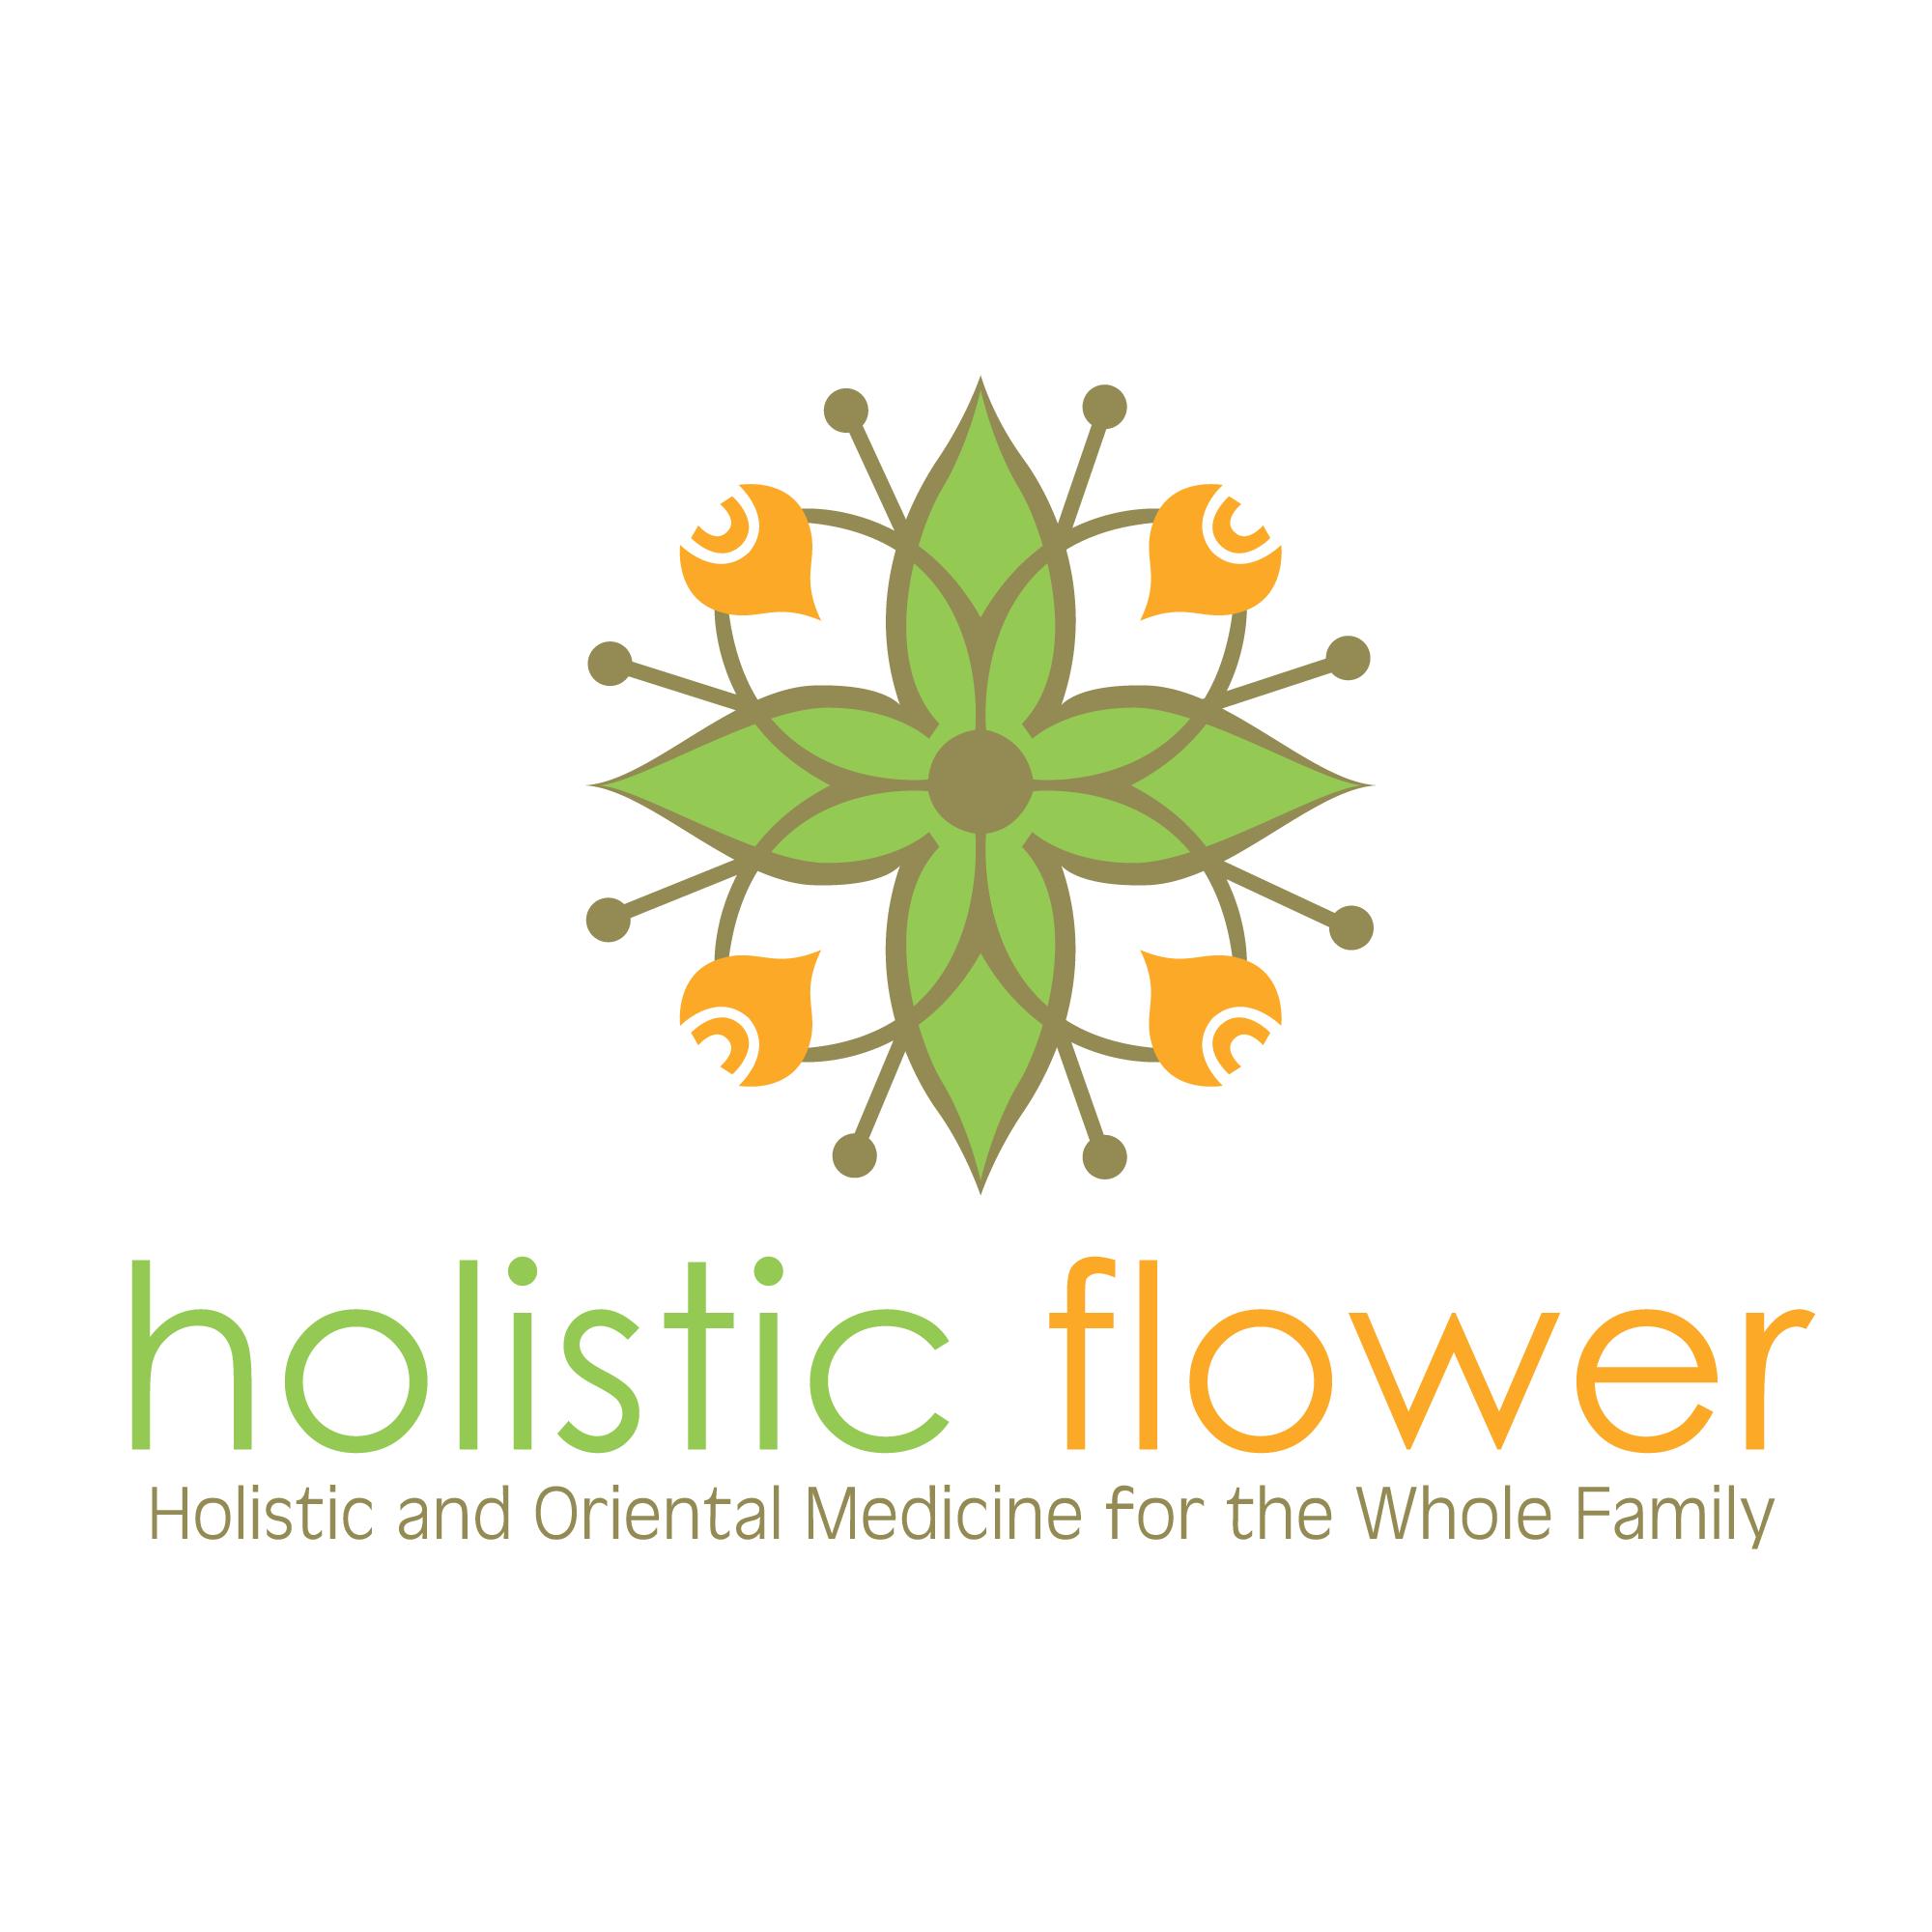 holistic-flower-[Converted]